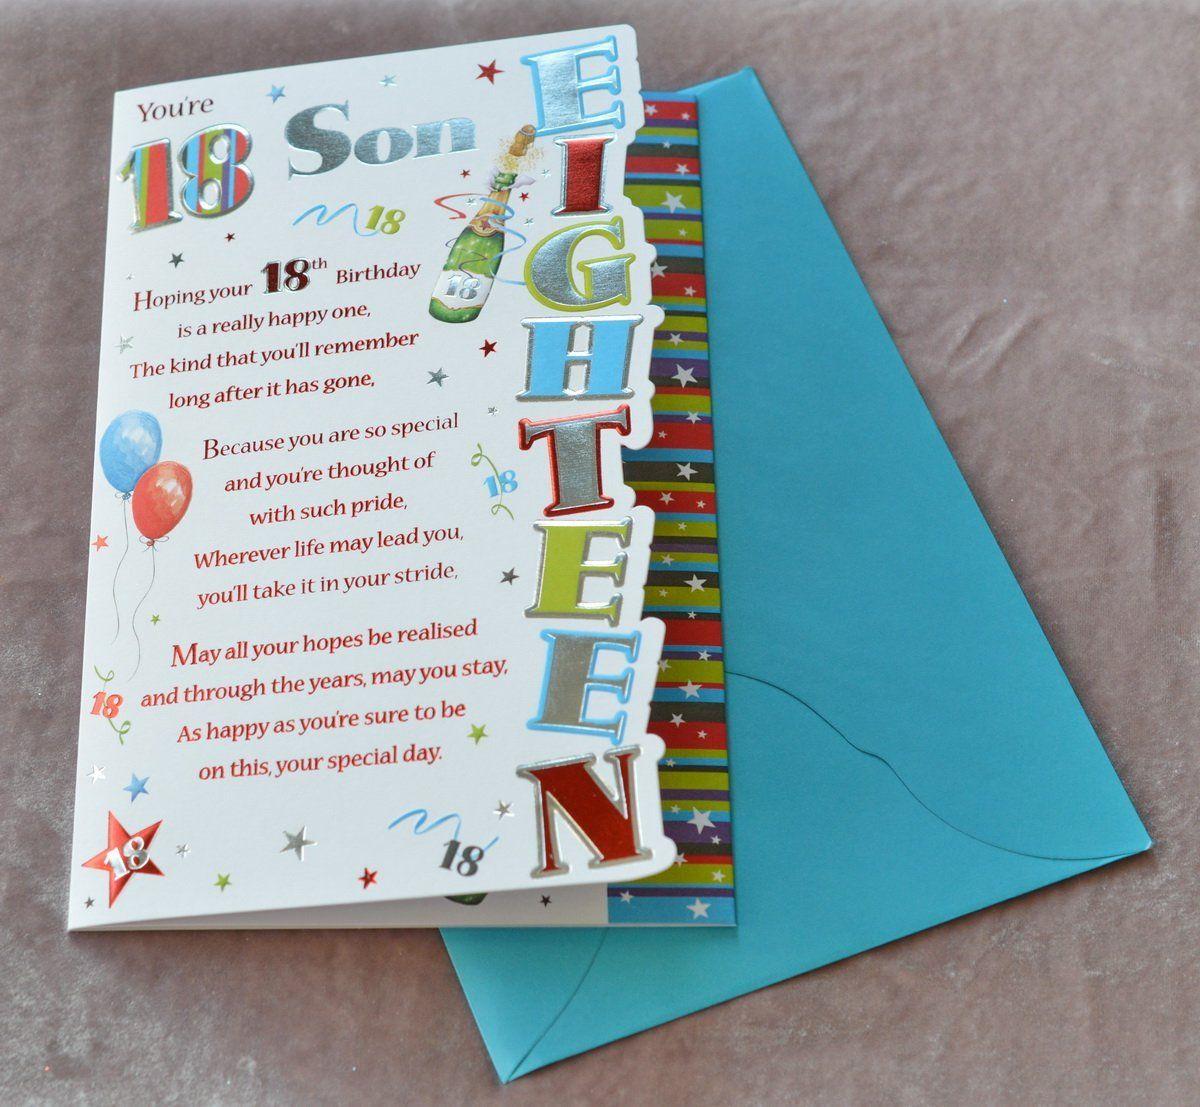 Son 18th Birthday Card Amazon.co.uk Kitchen & Home